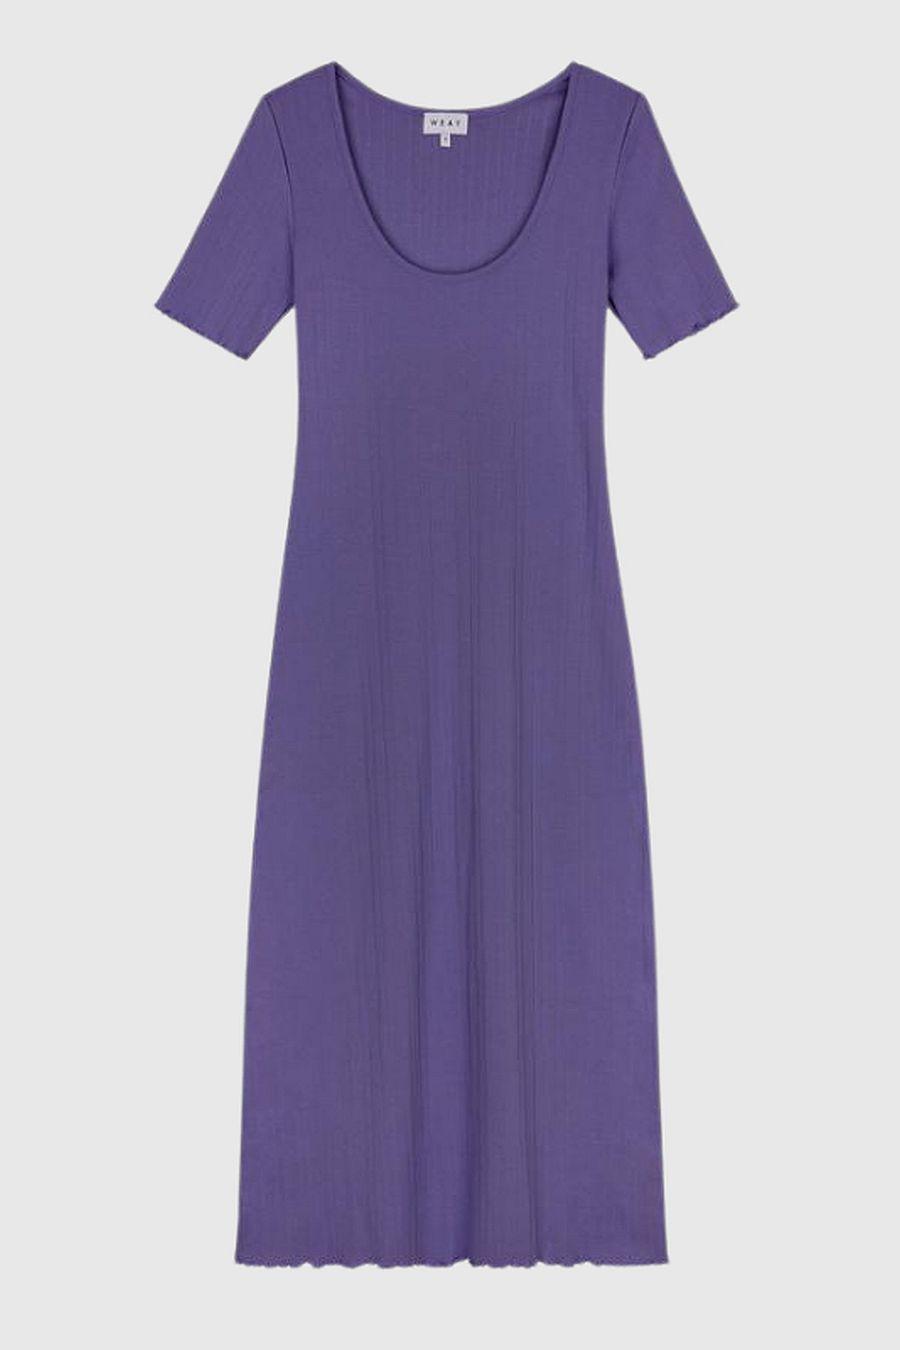 Wray NYC Keller Dress - Lilac